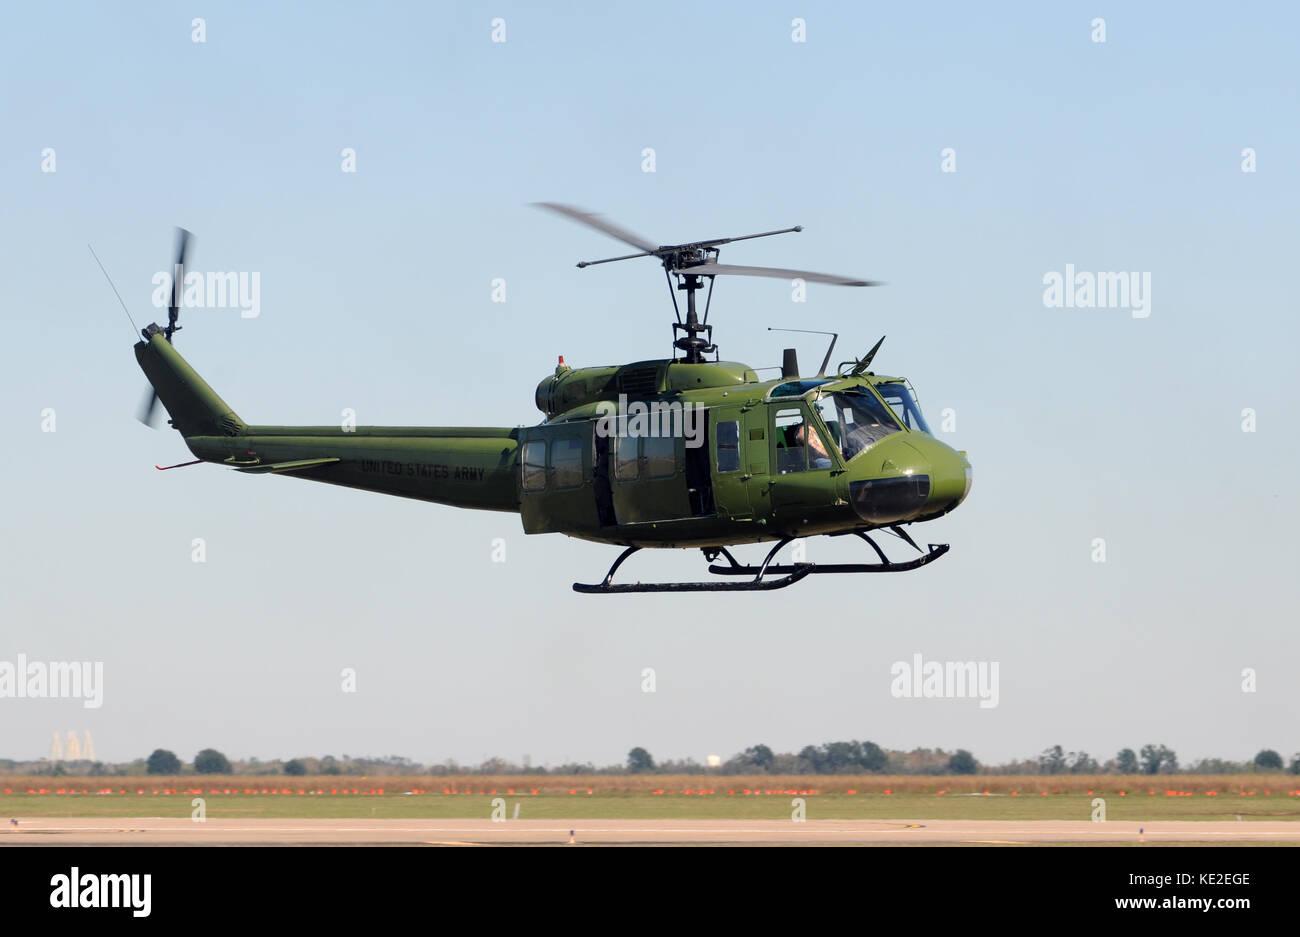 Vietnam War era US army helicopter Stock Photo: 163553838